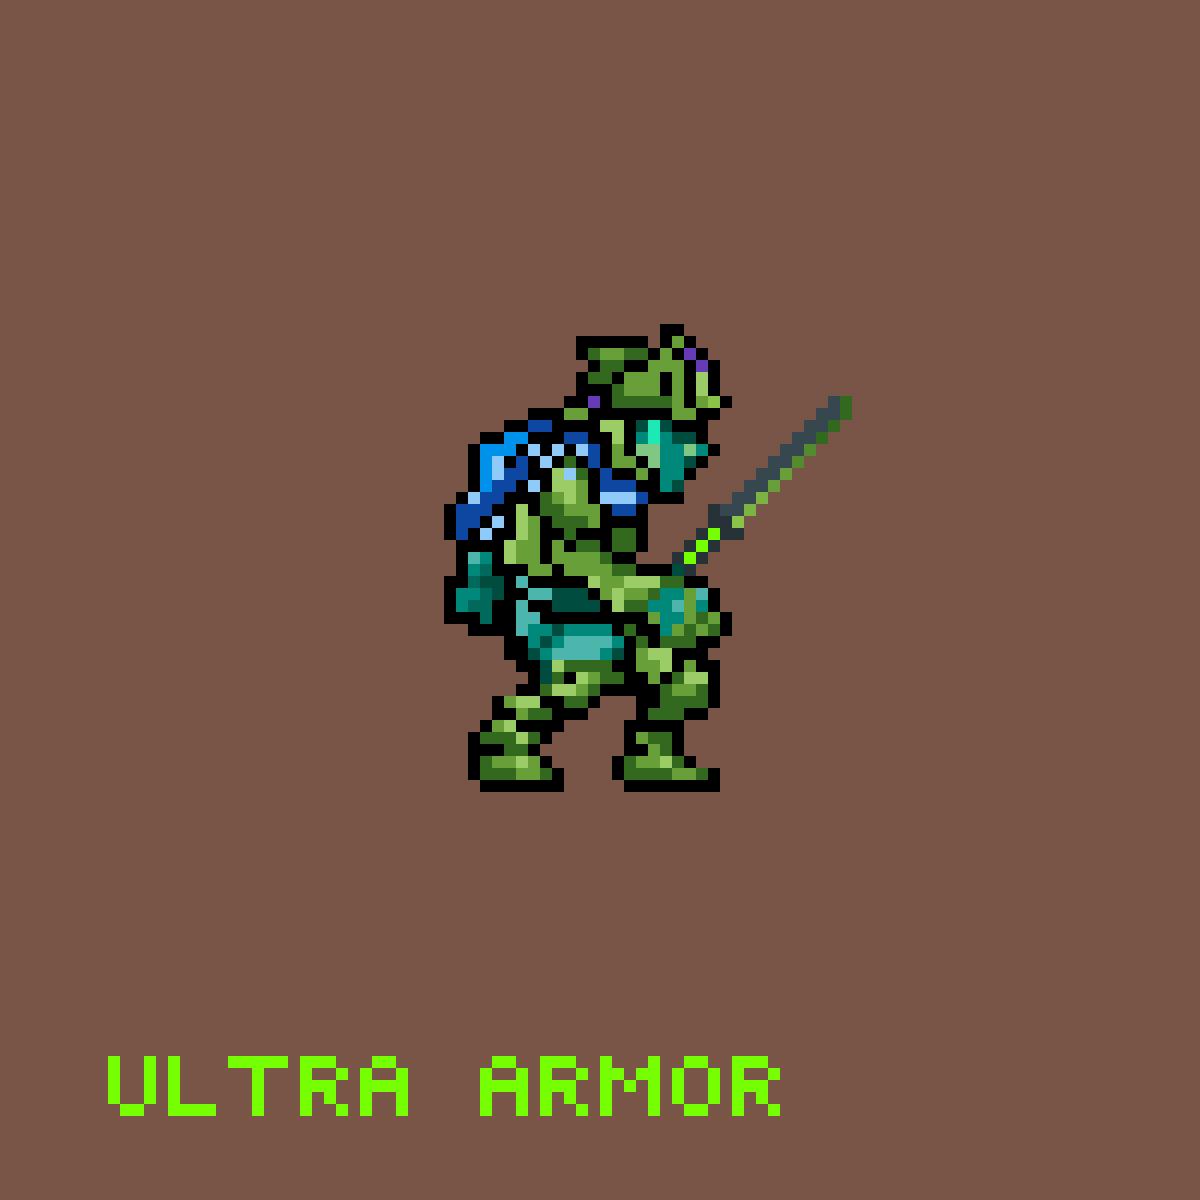 Ultra's Armor by Ultracruz